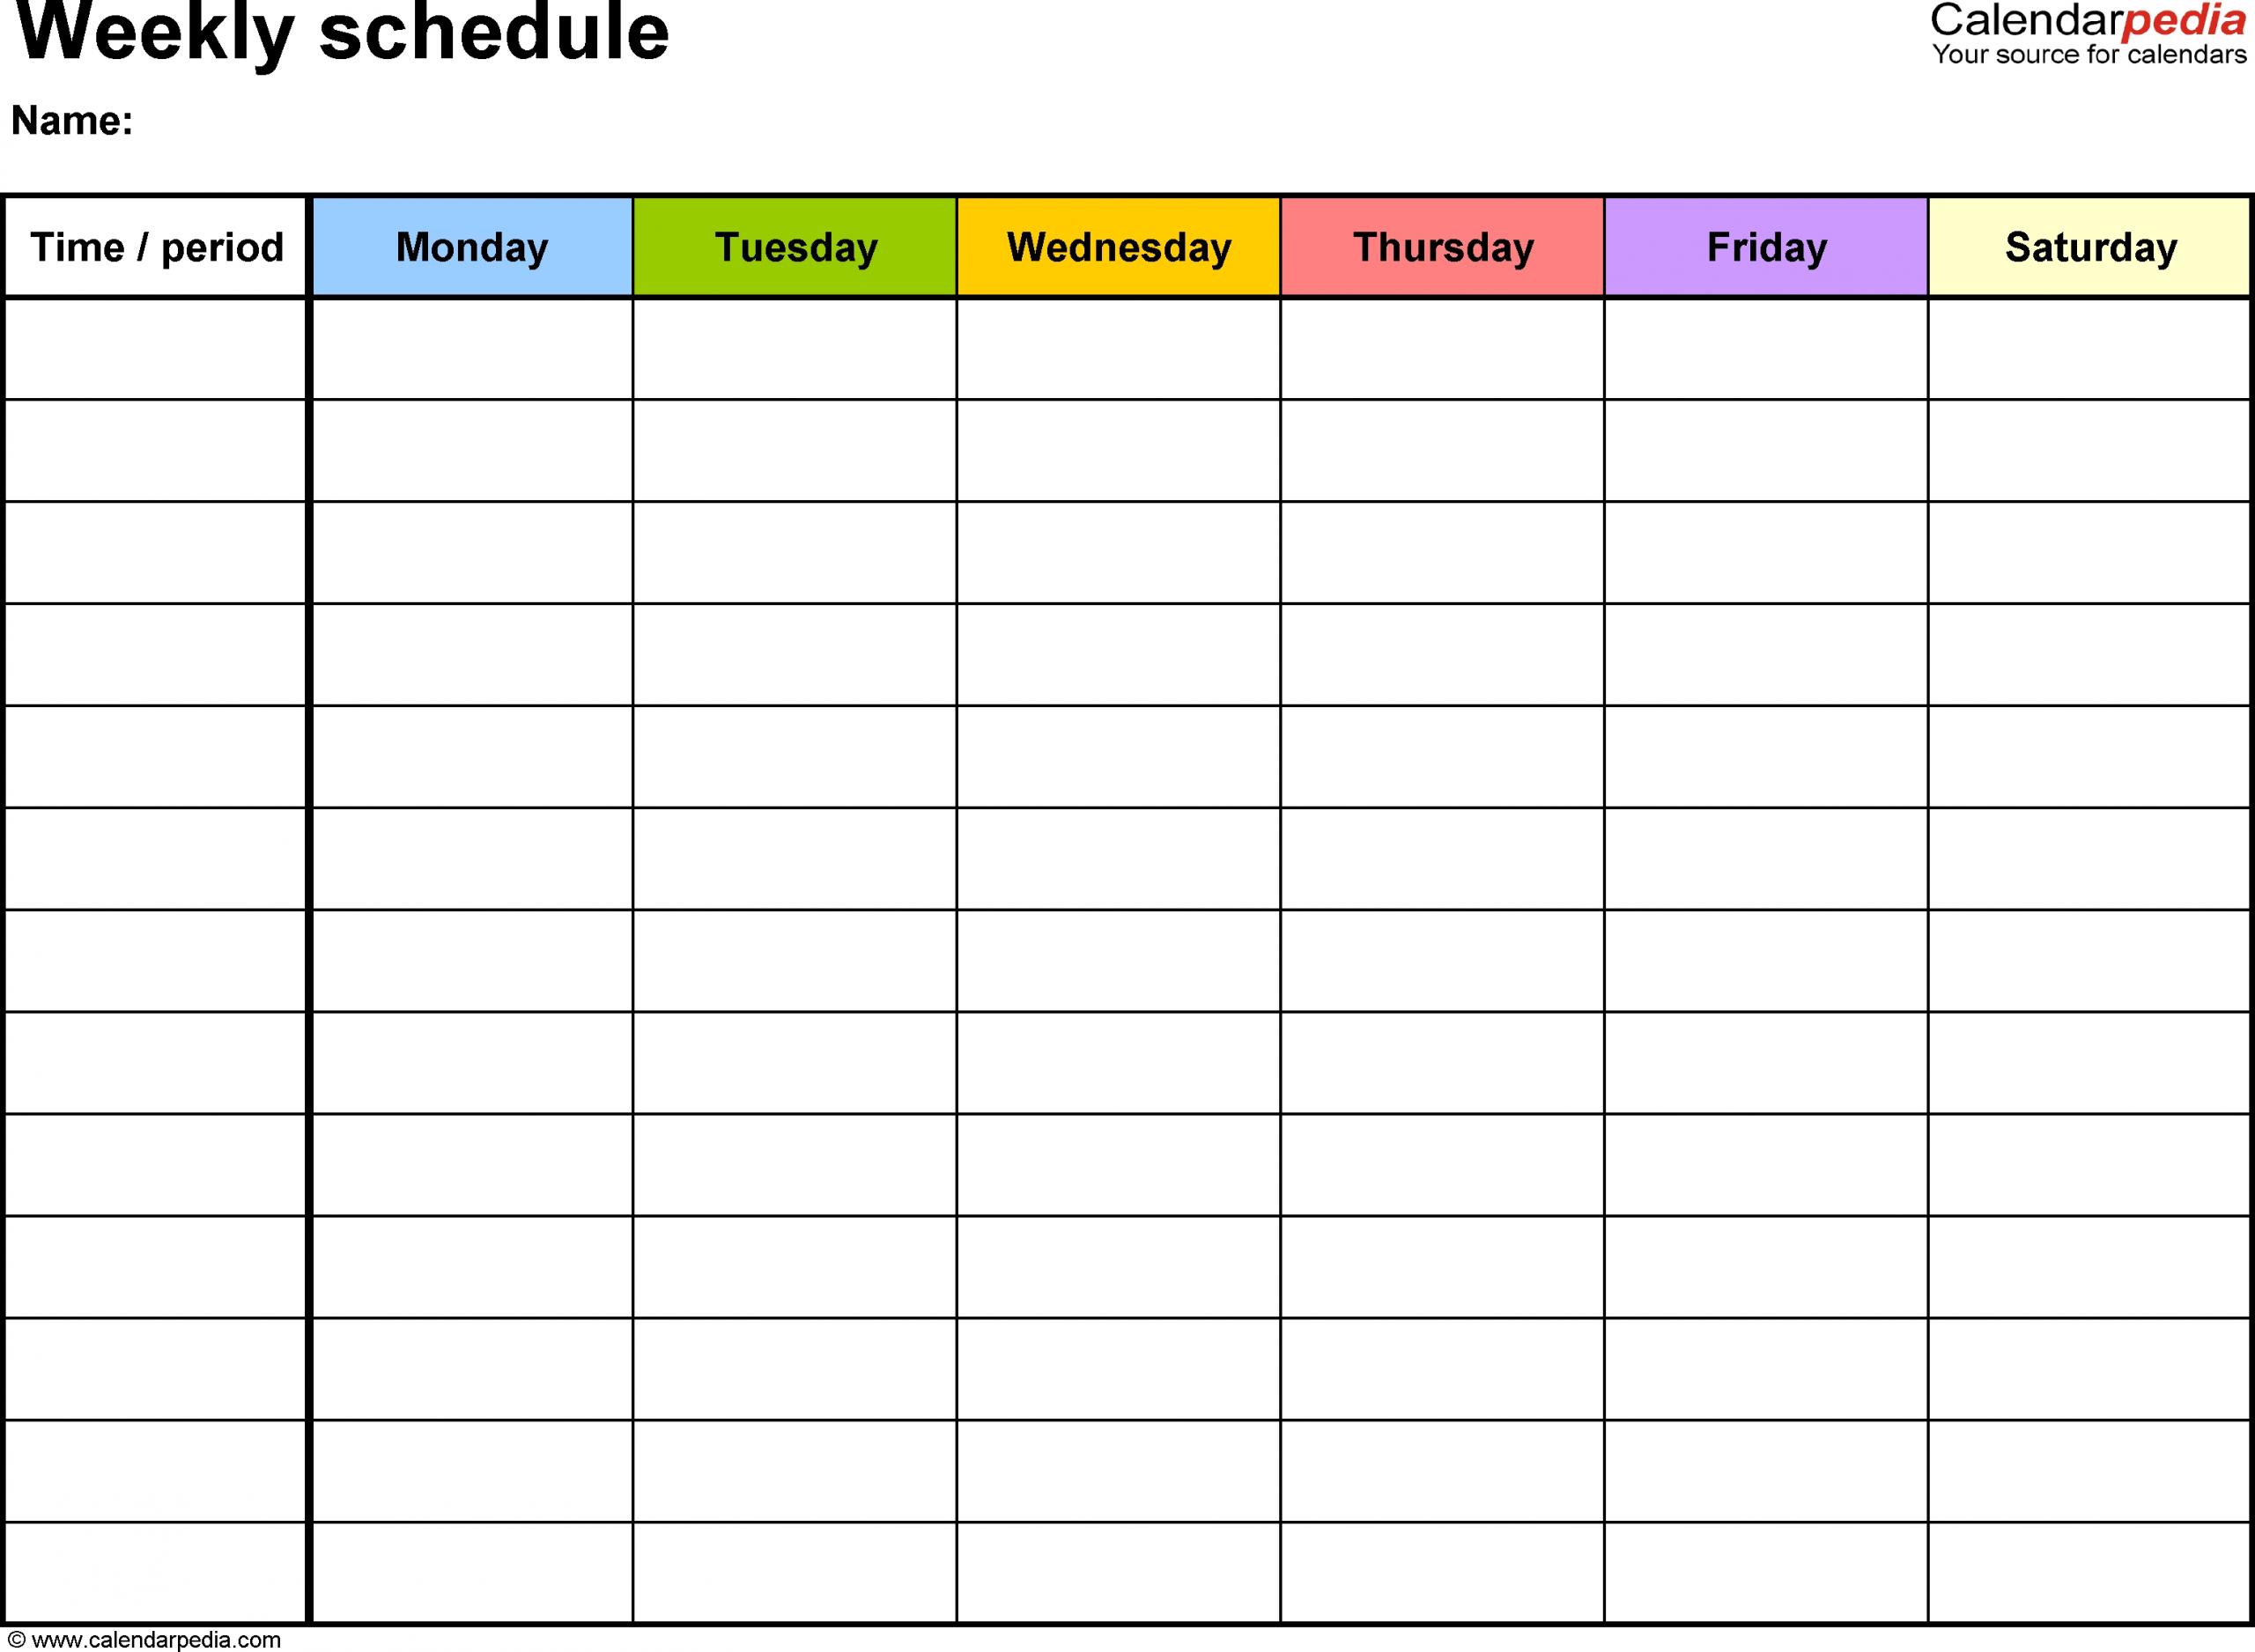 Calendar Fill In Templates | Calendar Template Printable Fill In Calendars To Print